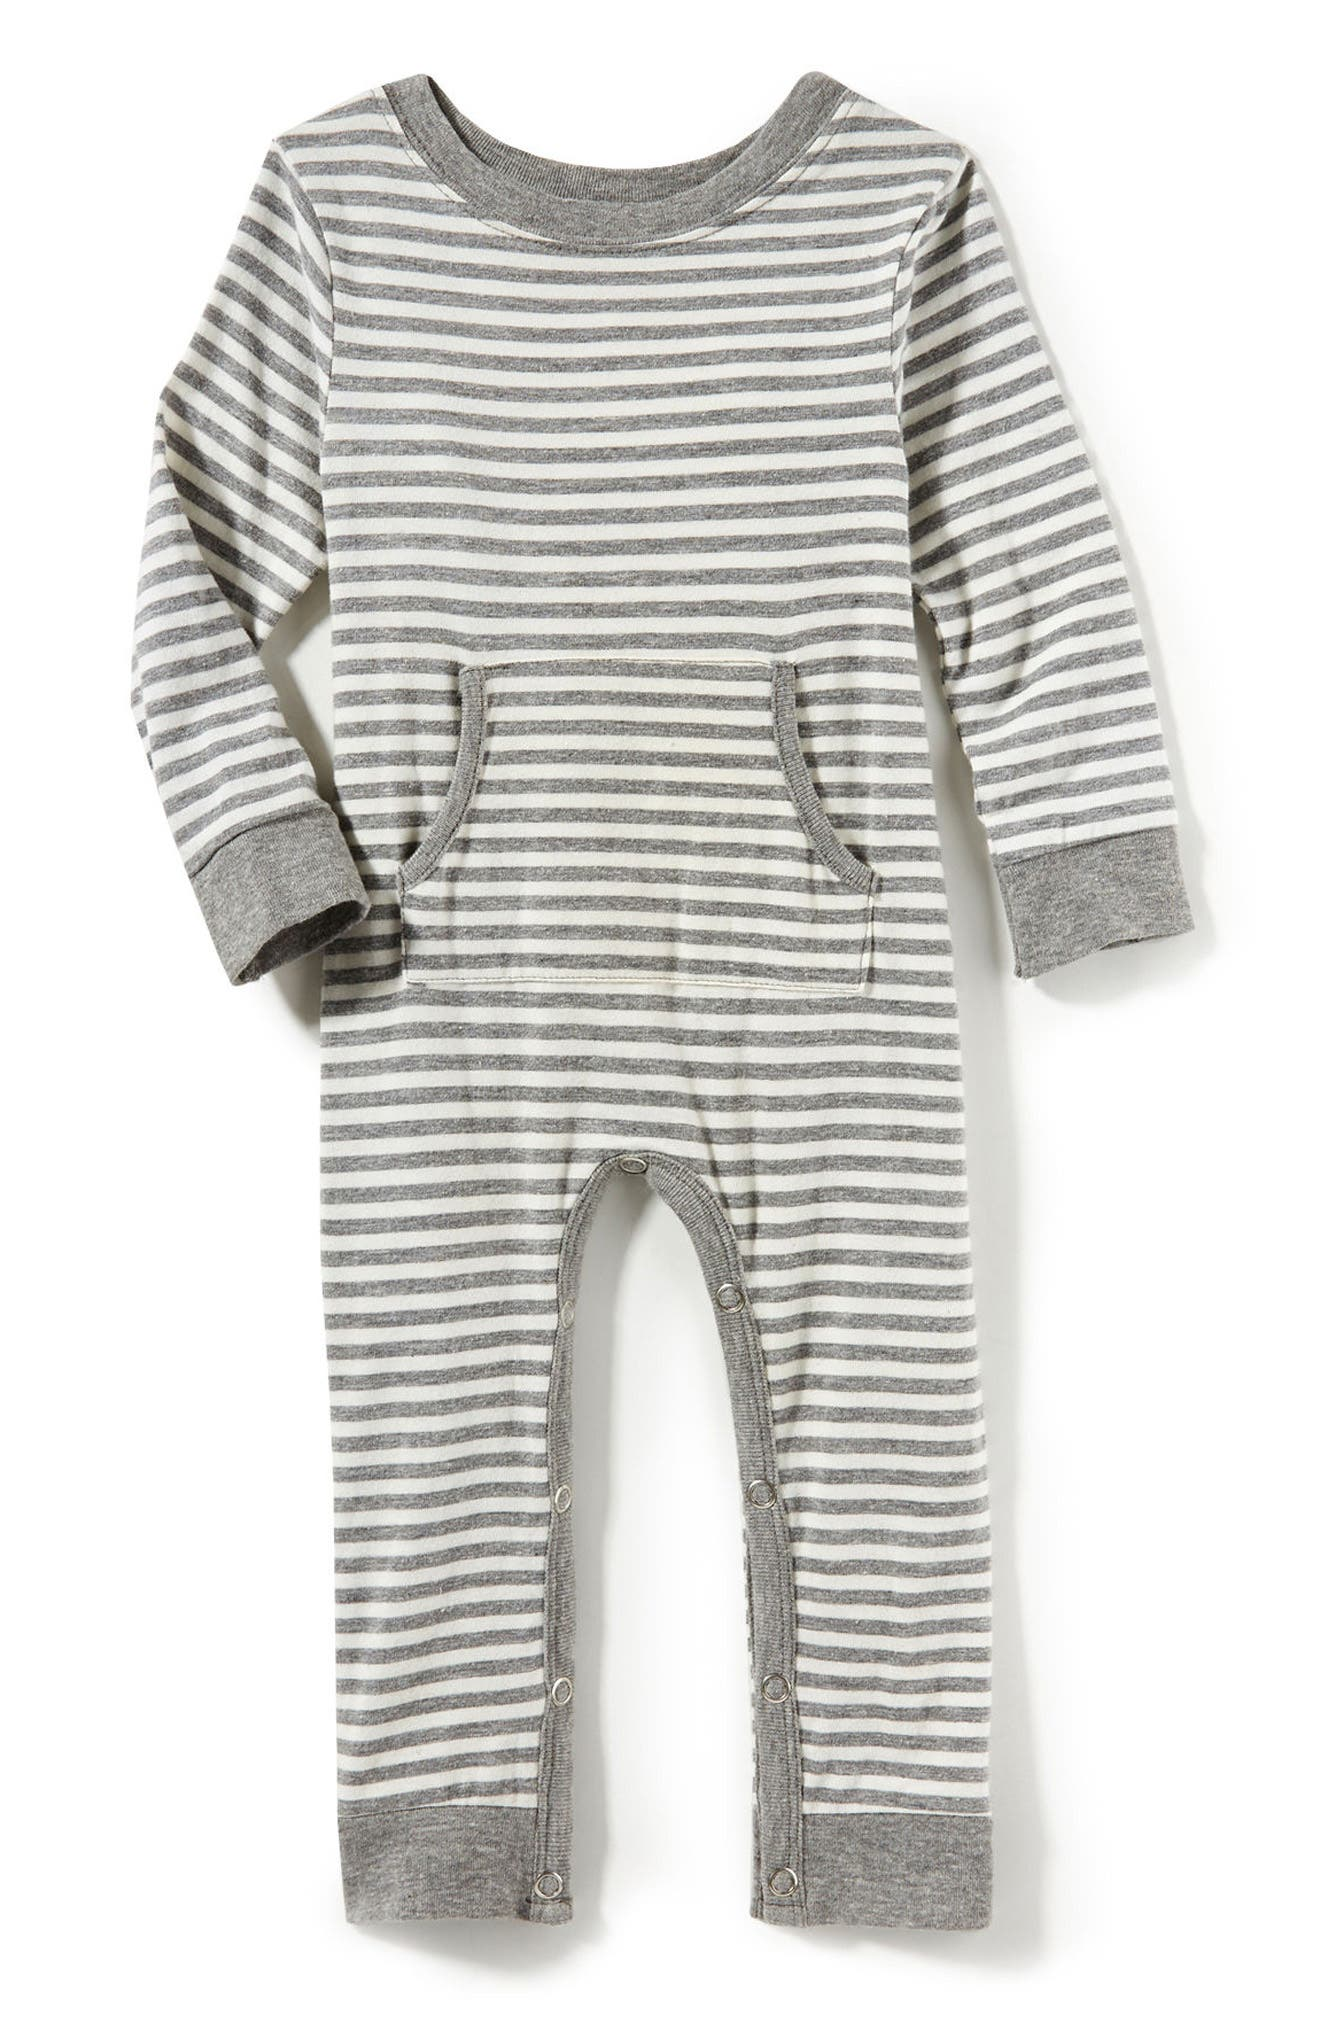 Main Image - Peek Stripe Romper (Baby)